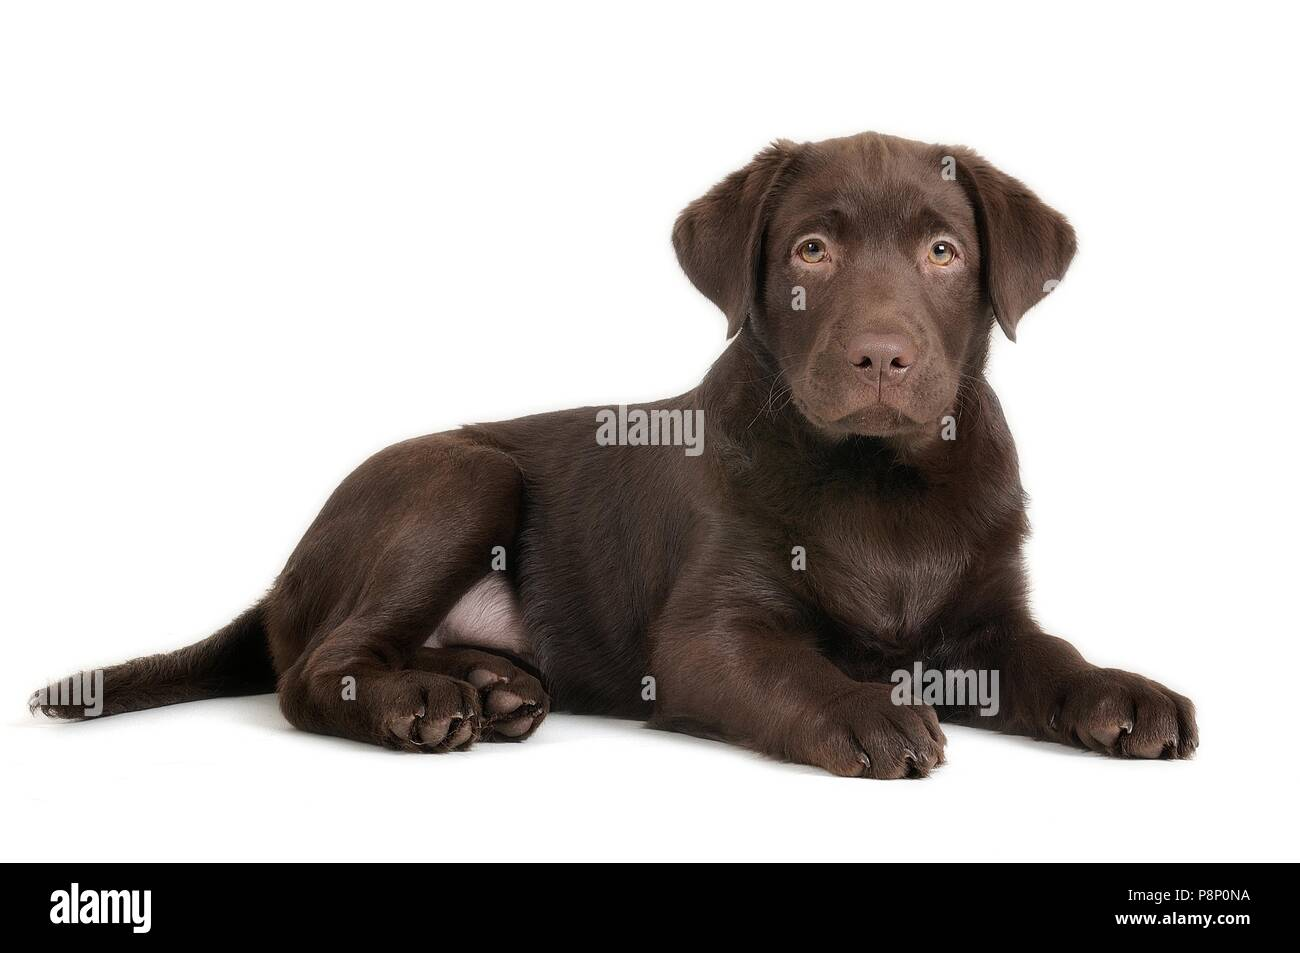 Labrador puppy in the photostudio. - Stock Image